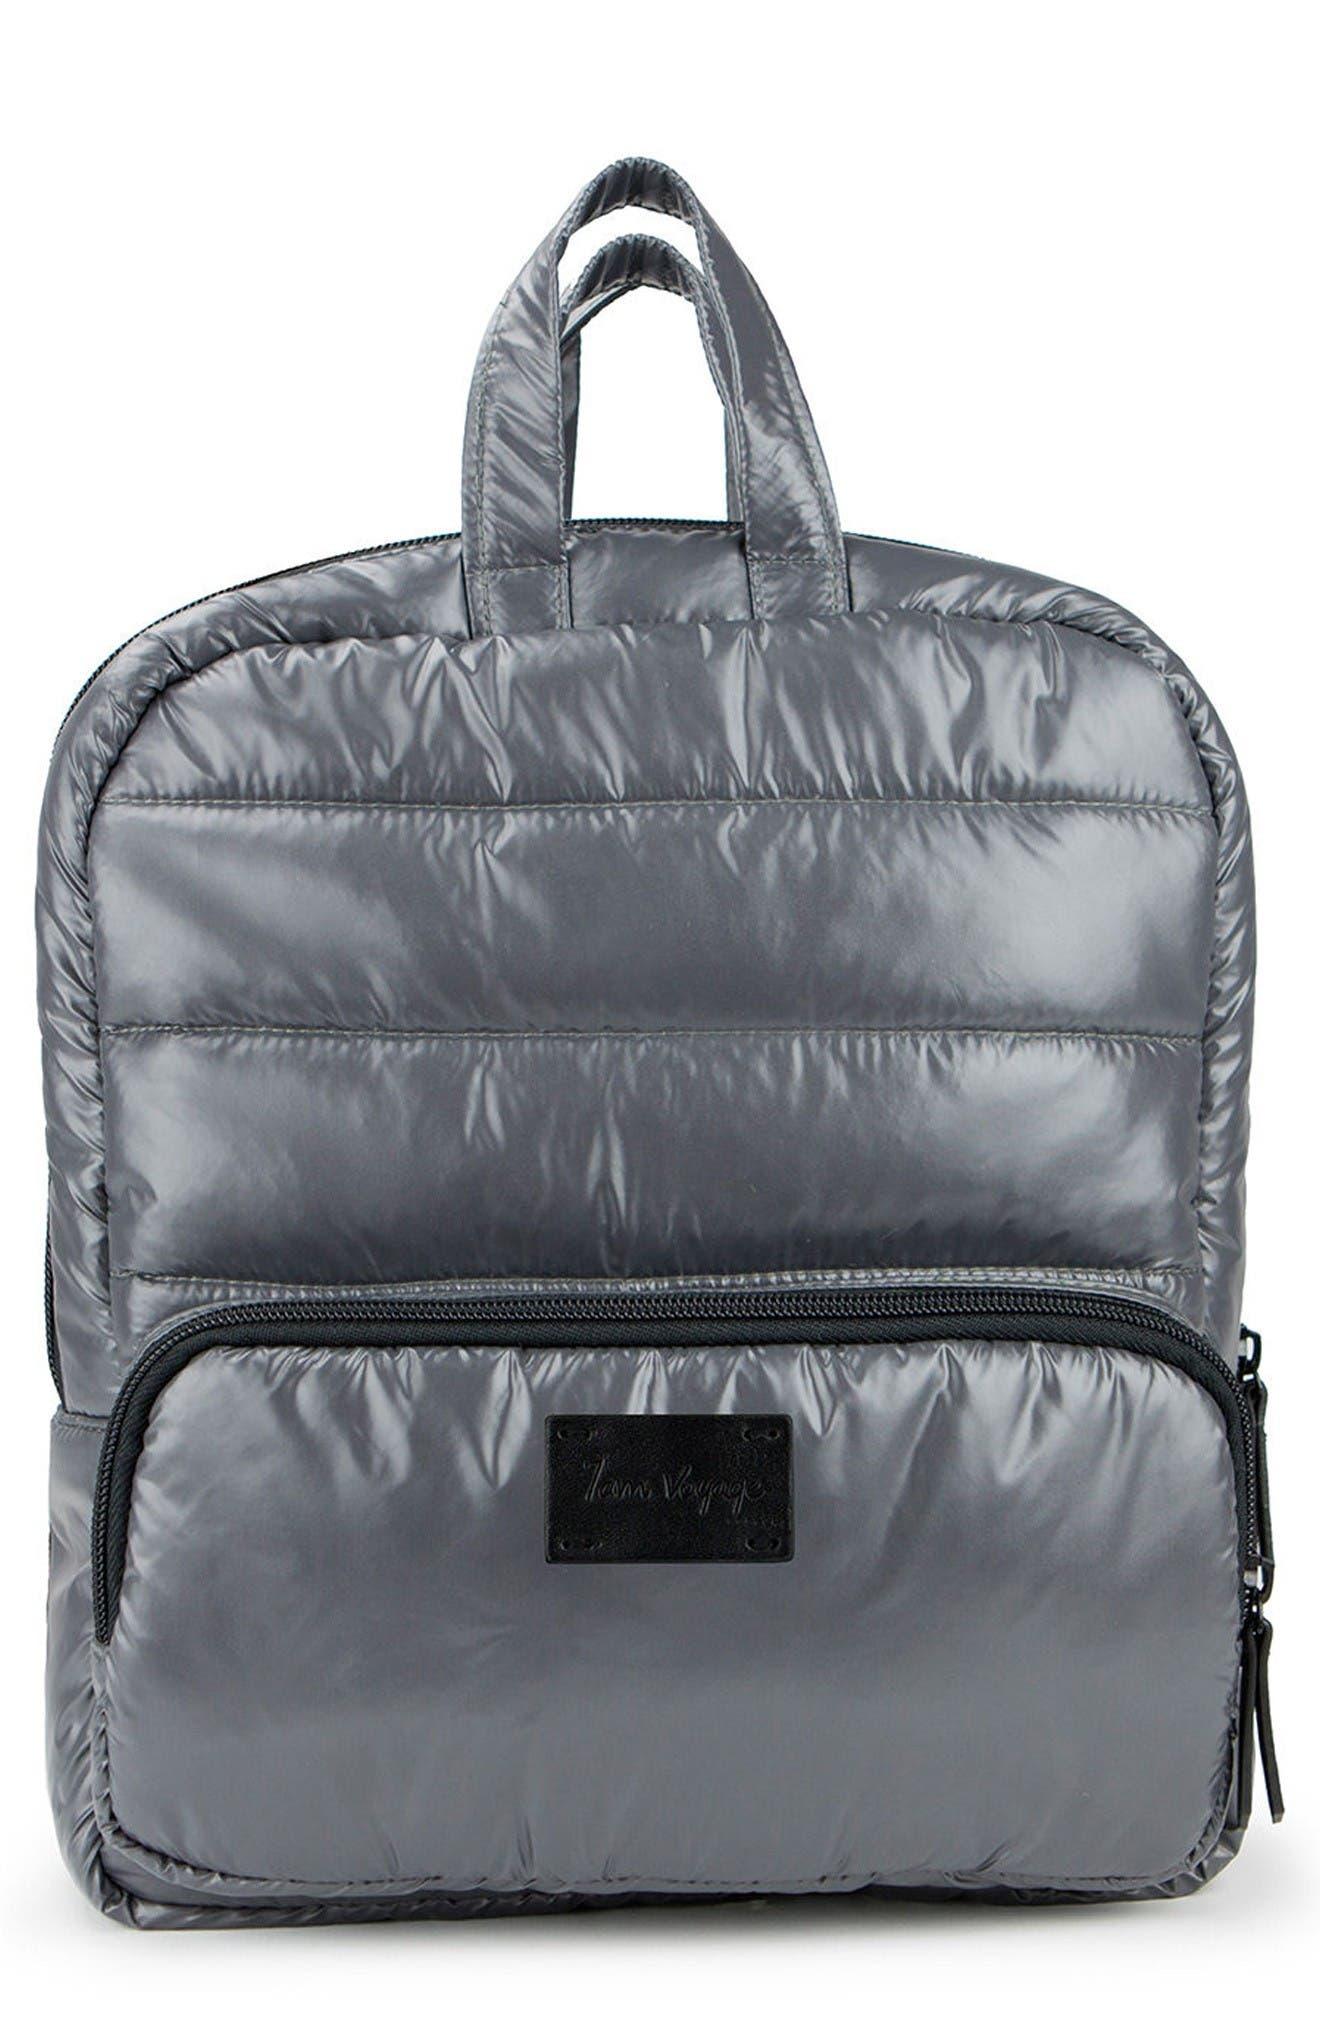 Mini Water Repellent Backpack,                         Main,                         color, Graphite